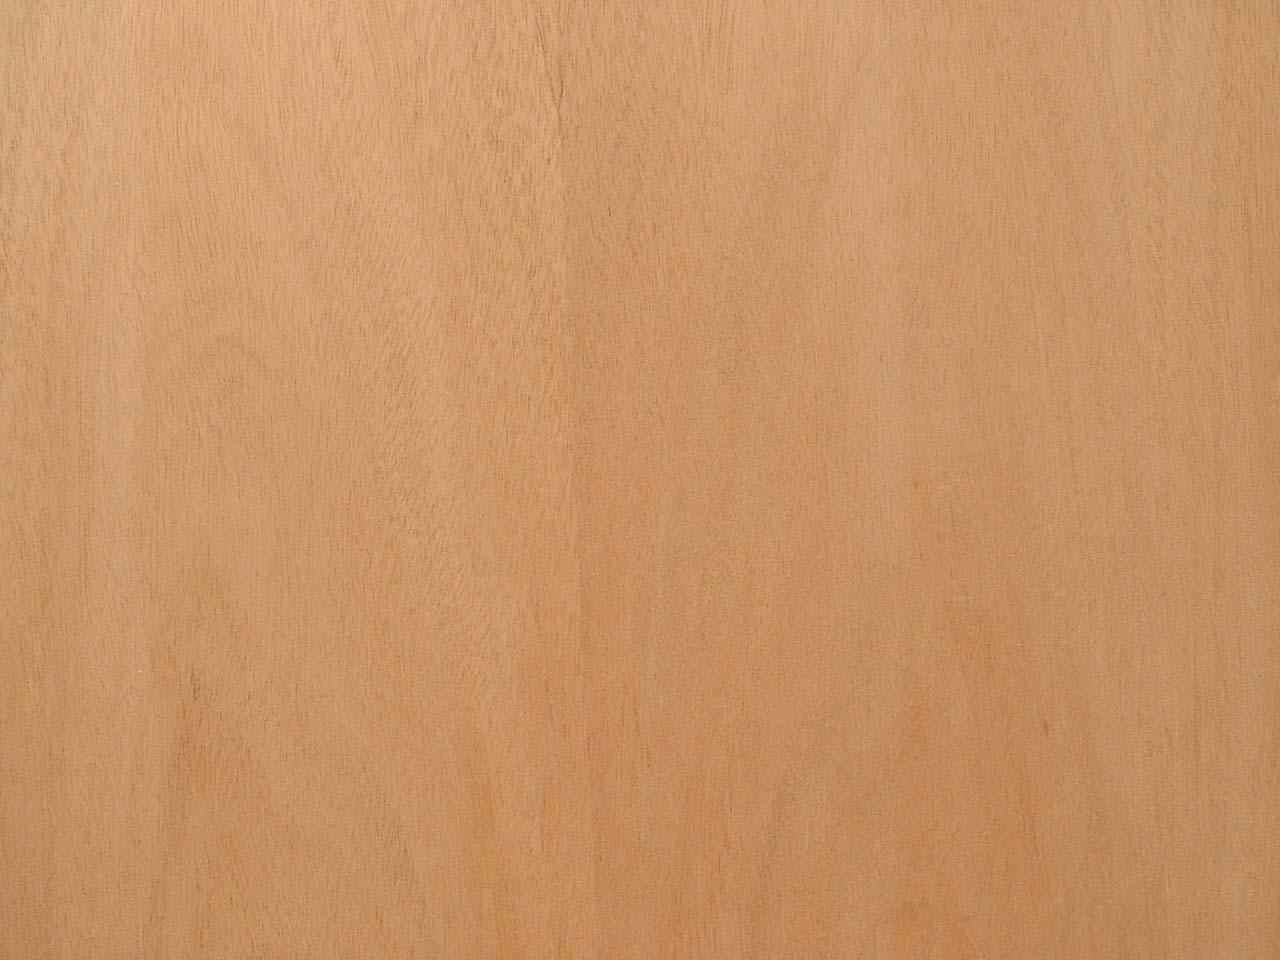 Обычные текстуры - Текстуры - Errant Page: fps-creator.ucoz.ru/photo/2